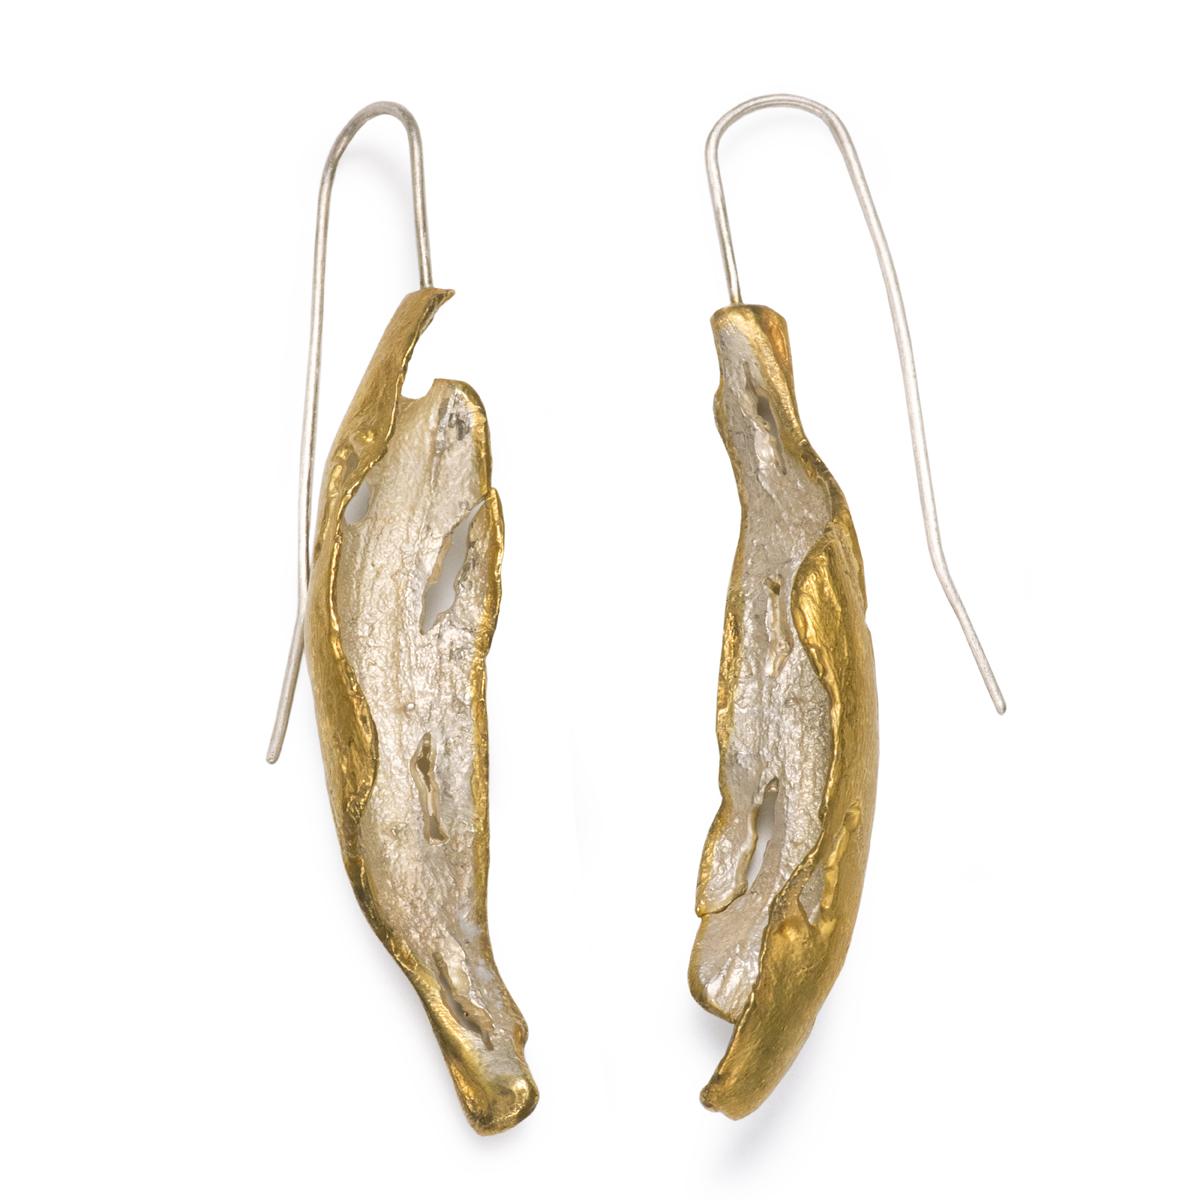 Fire and Earth Earrings